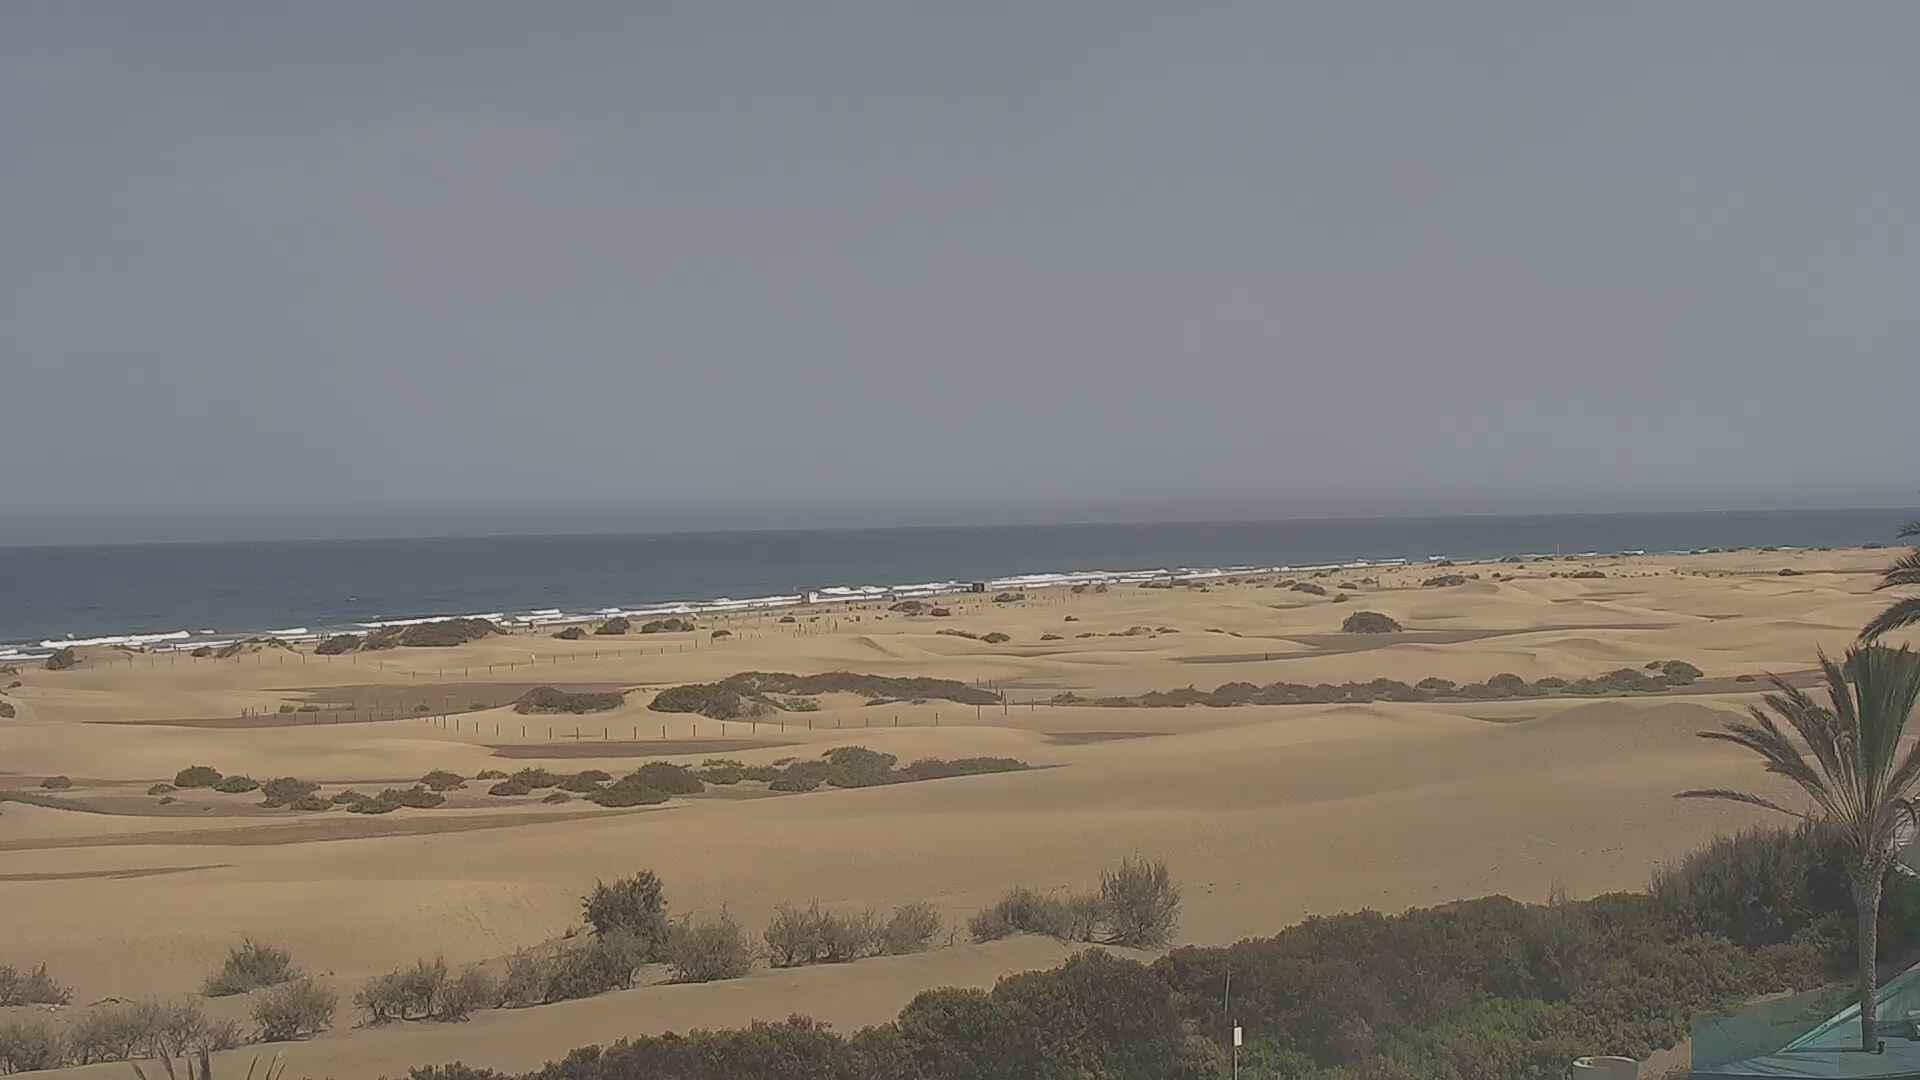 Playa del Ingles (Gran Canaria) Sat. 16:36